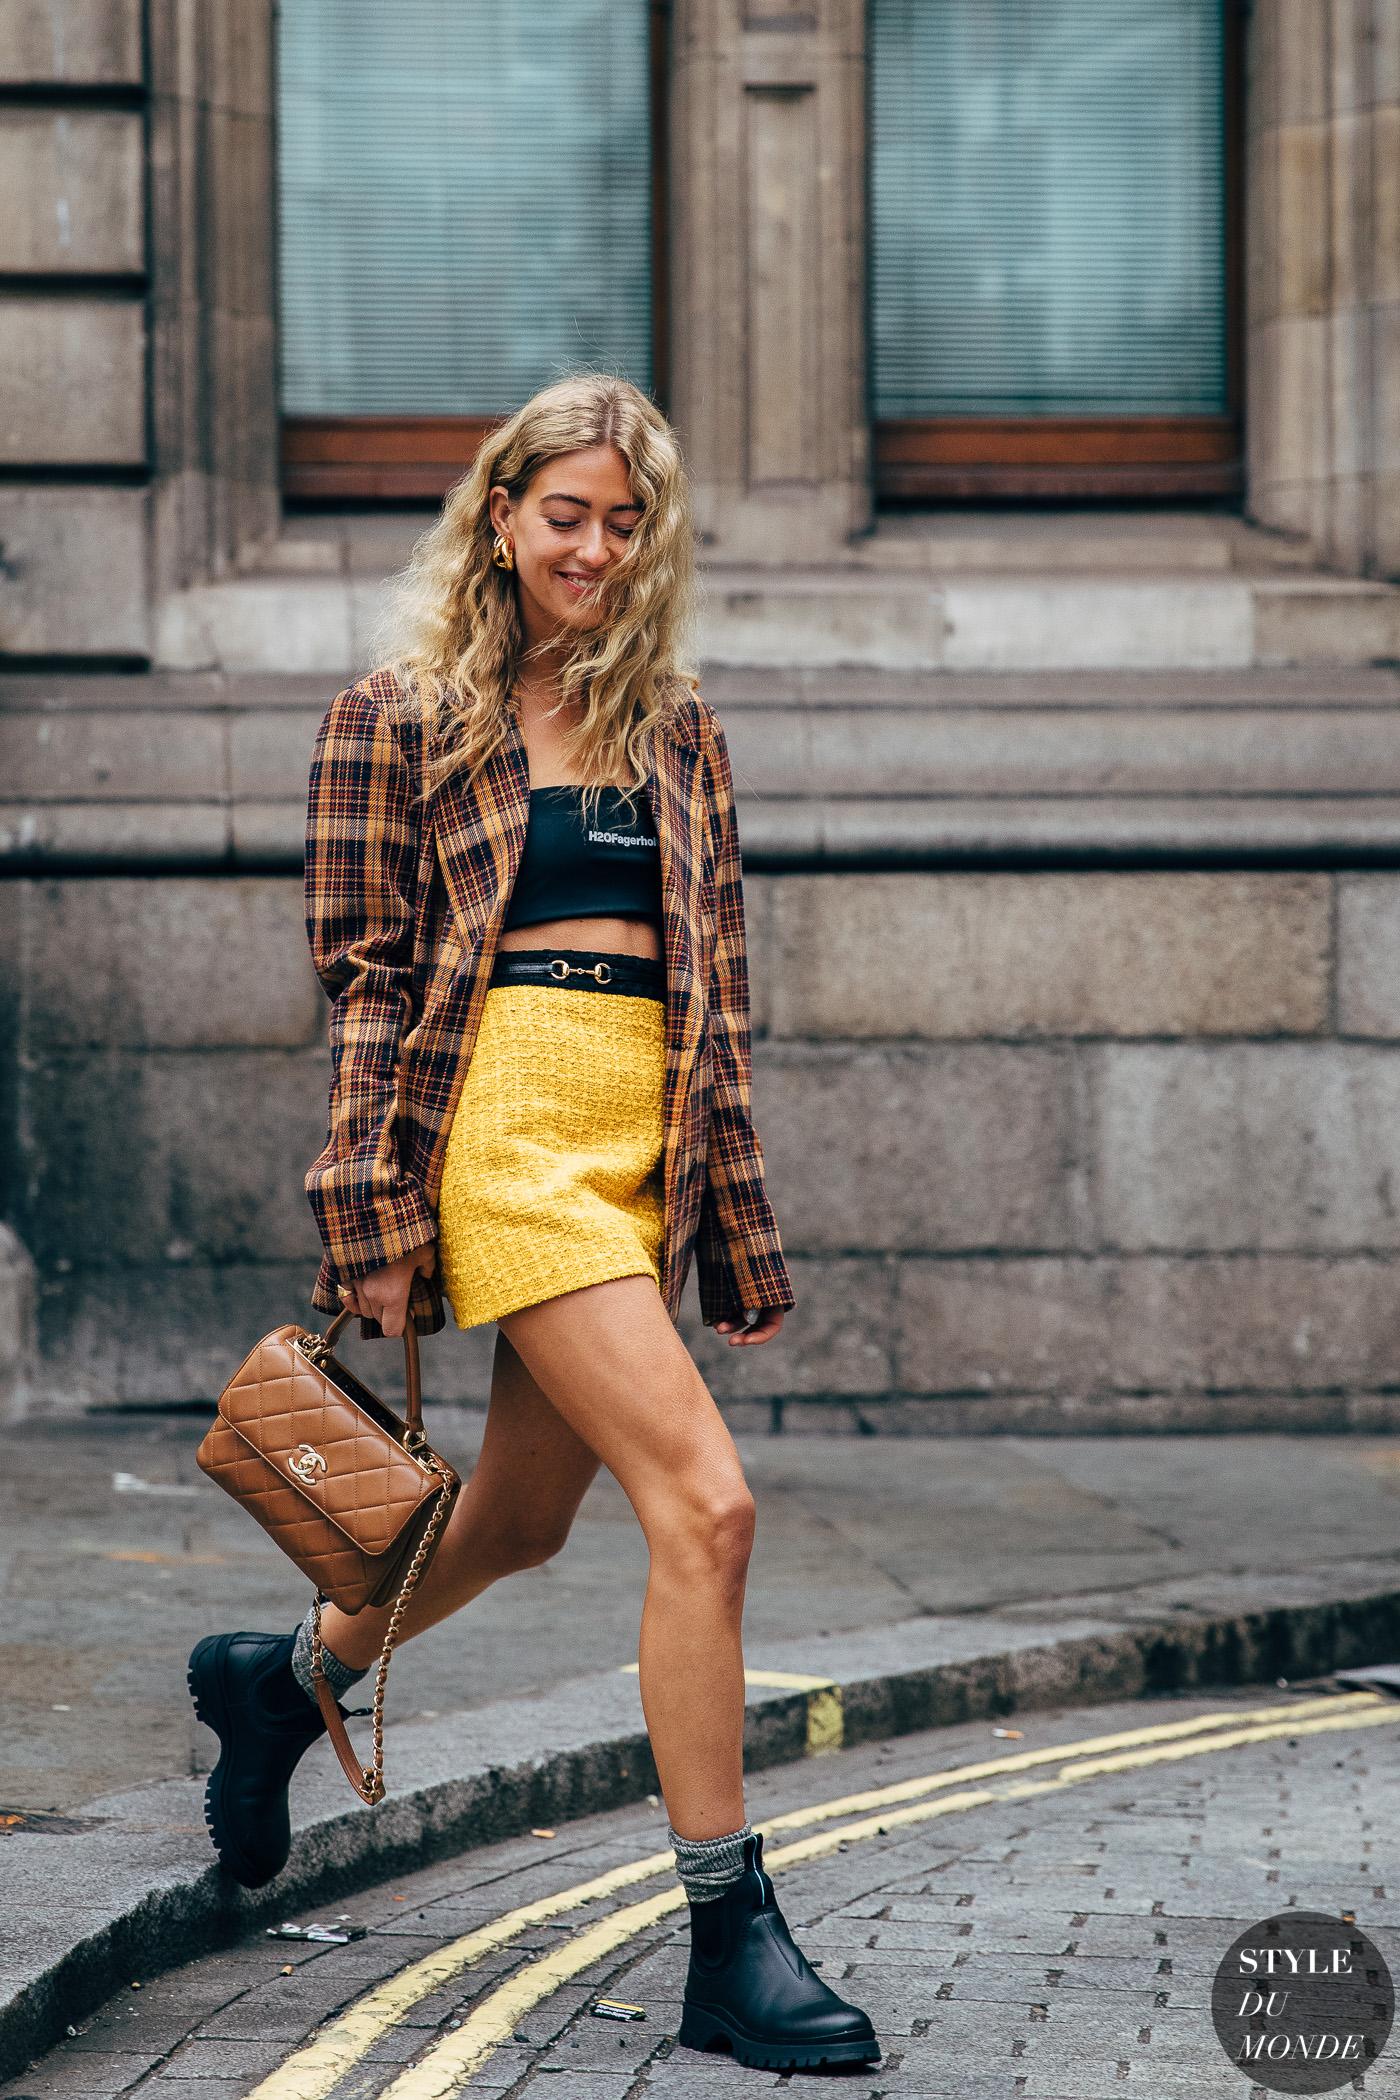 London FW 2019 Street Style: Emili Sindlev | Mode, Outfit